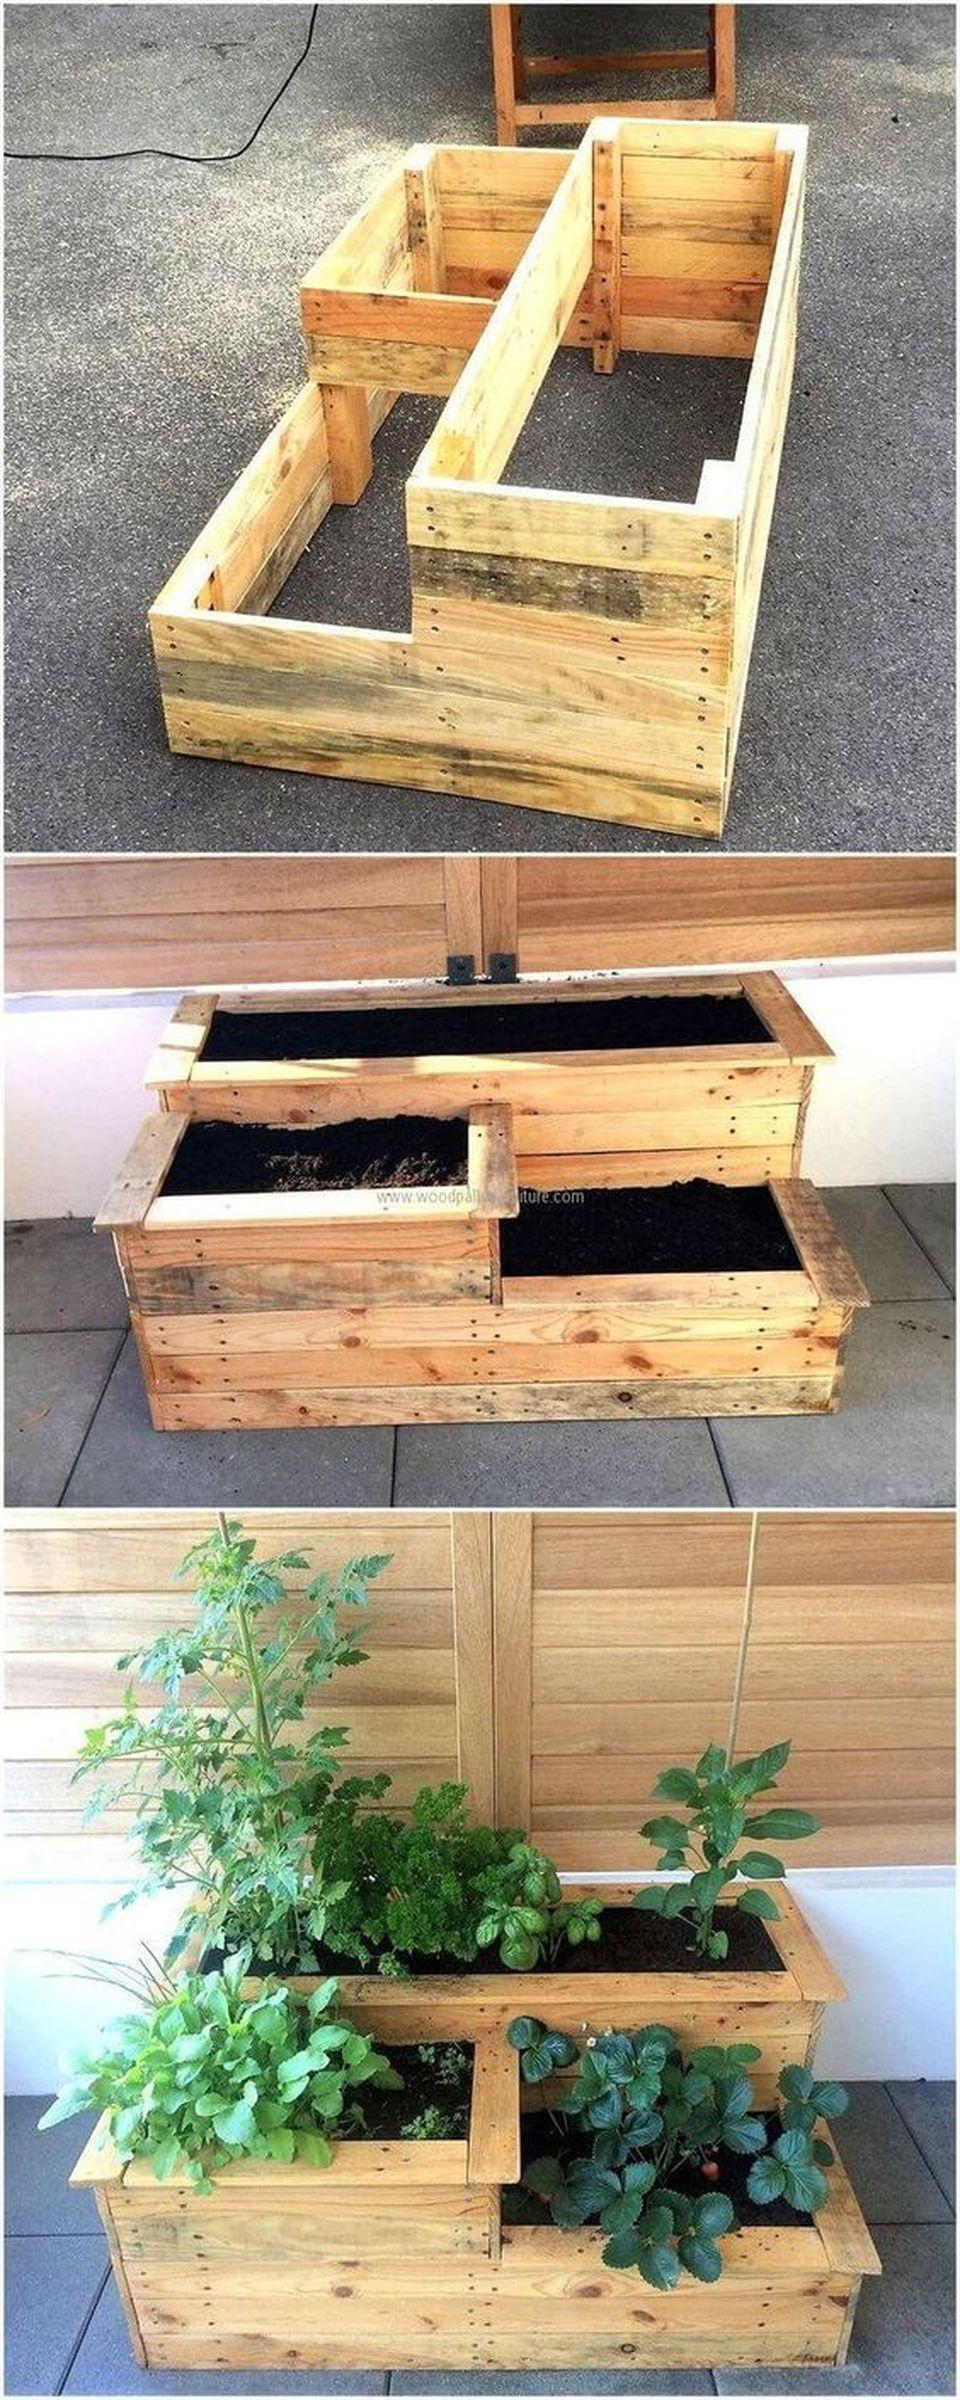 Amazing Creative Wood Pallet Garden Project 42 Wood Pallet